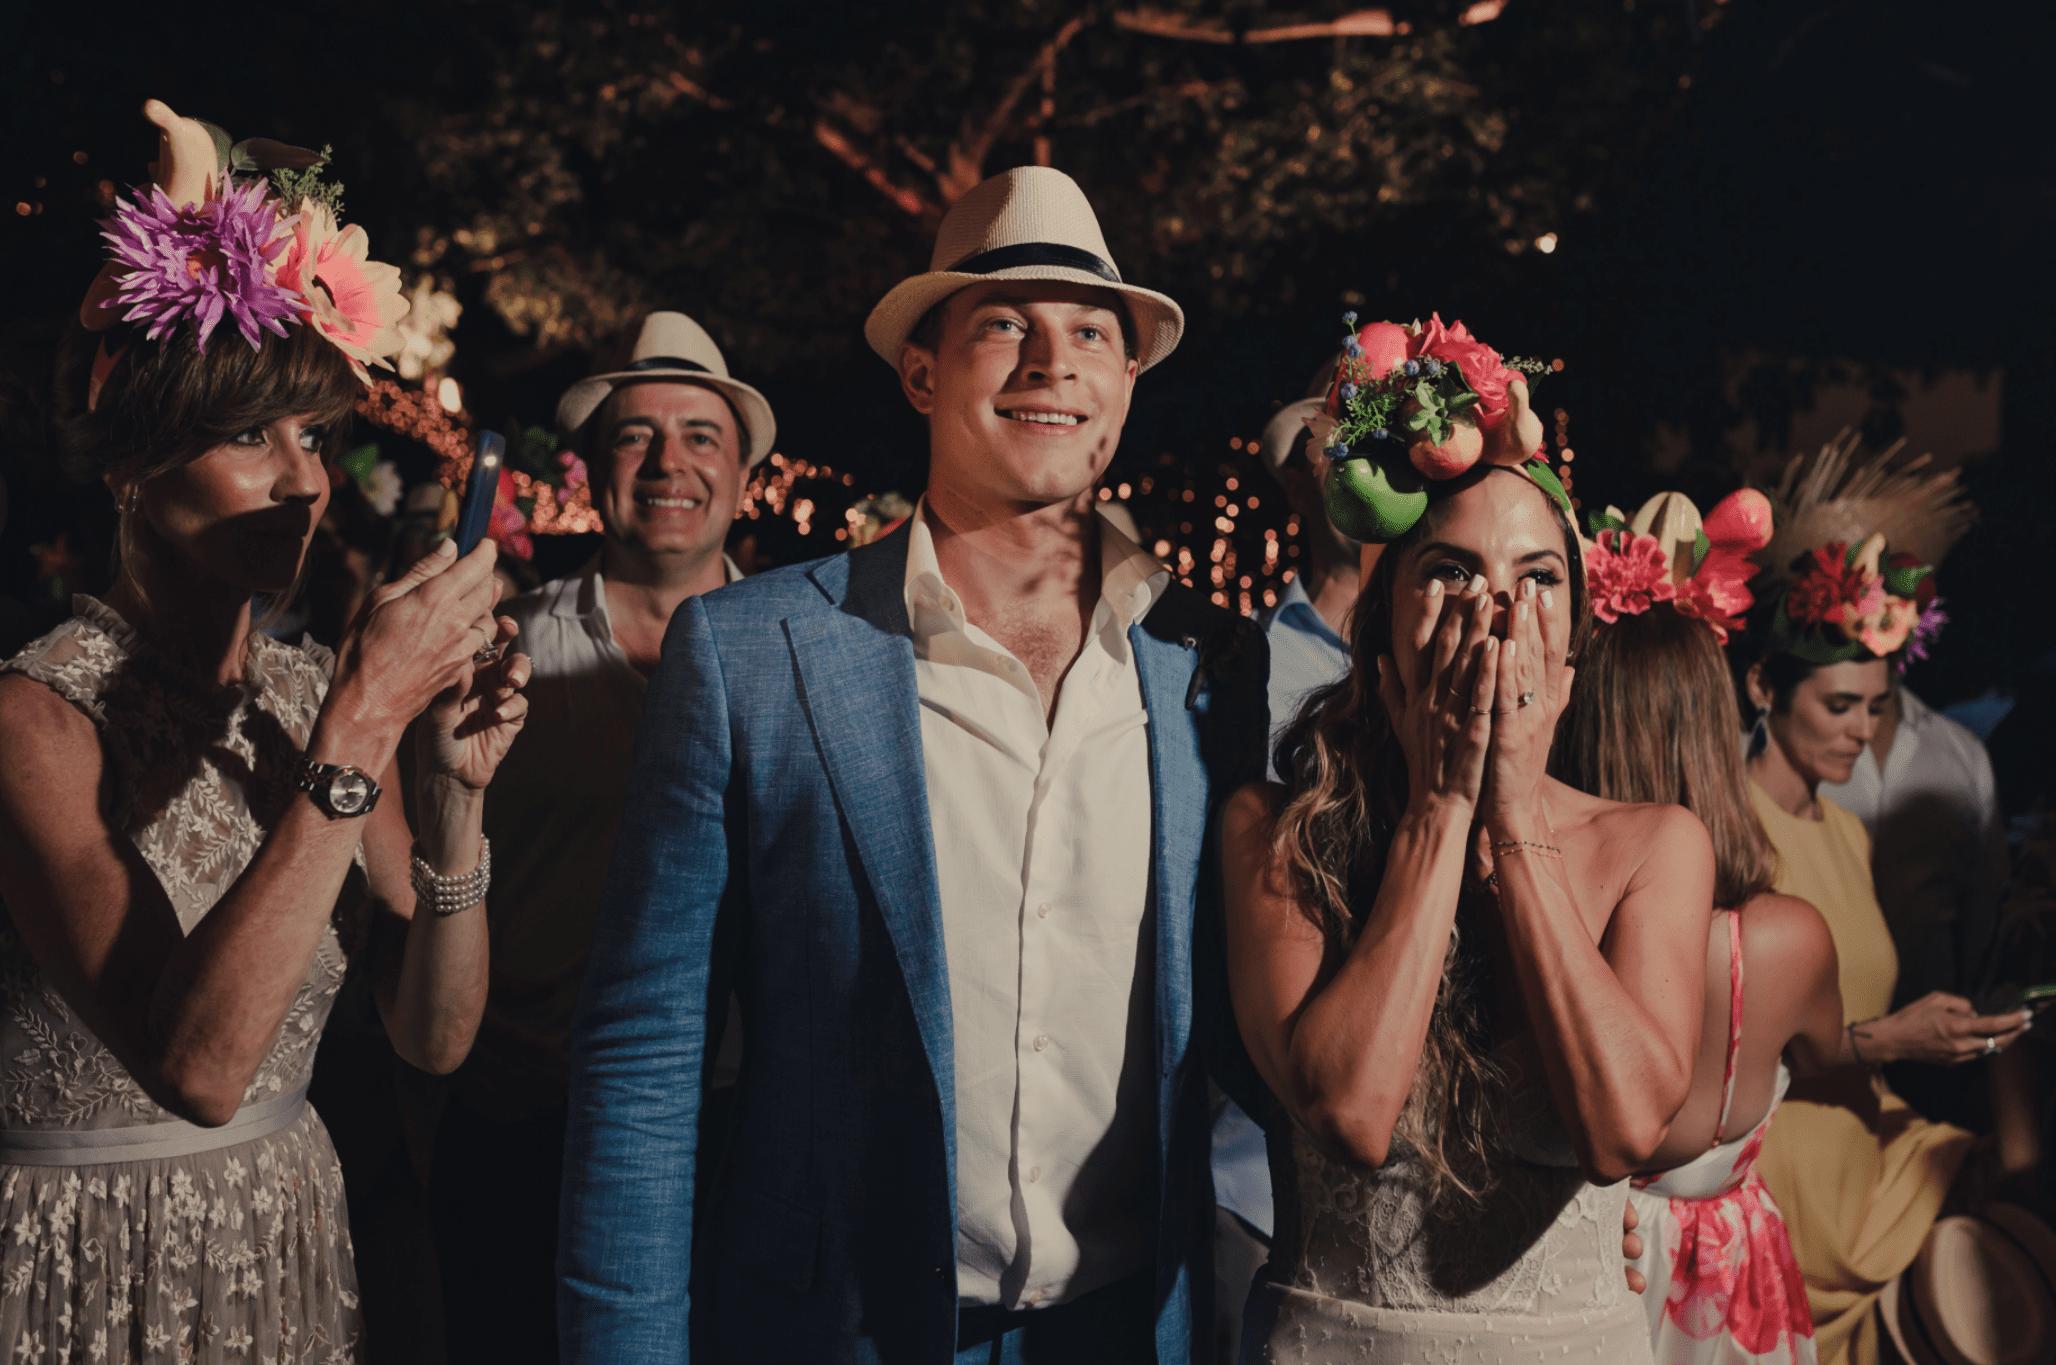 Wedding Guests in Hats